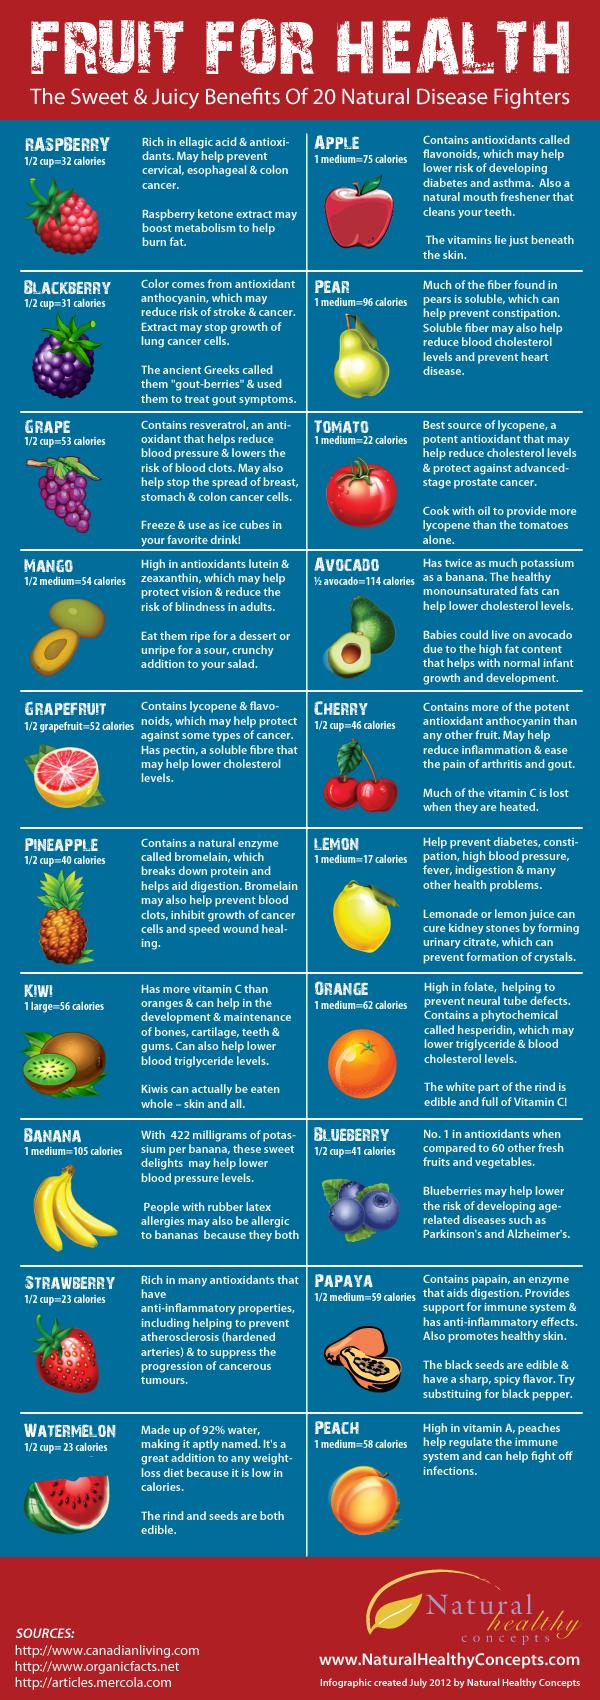 Fruit for health.